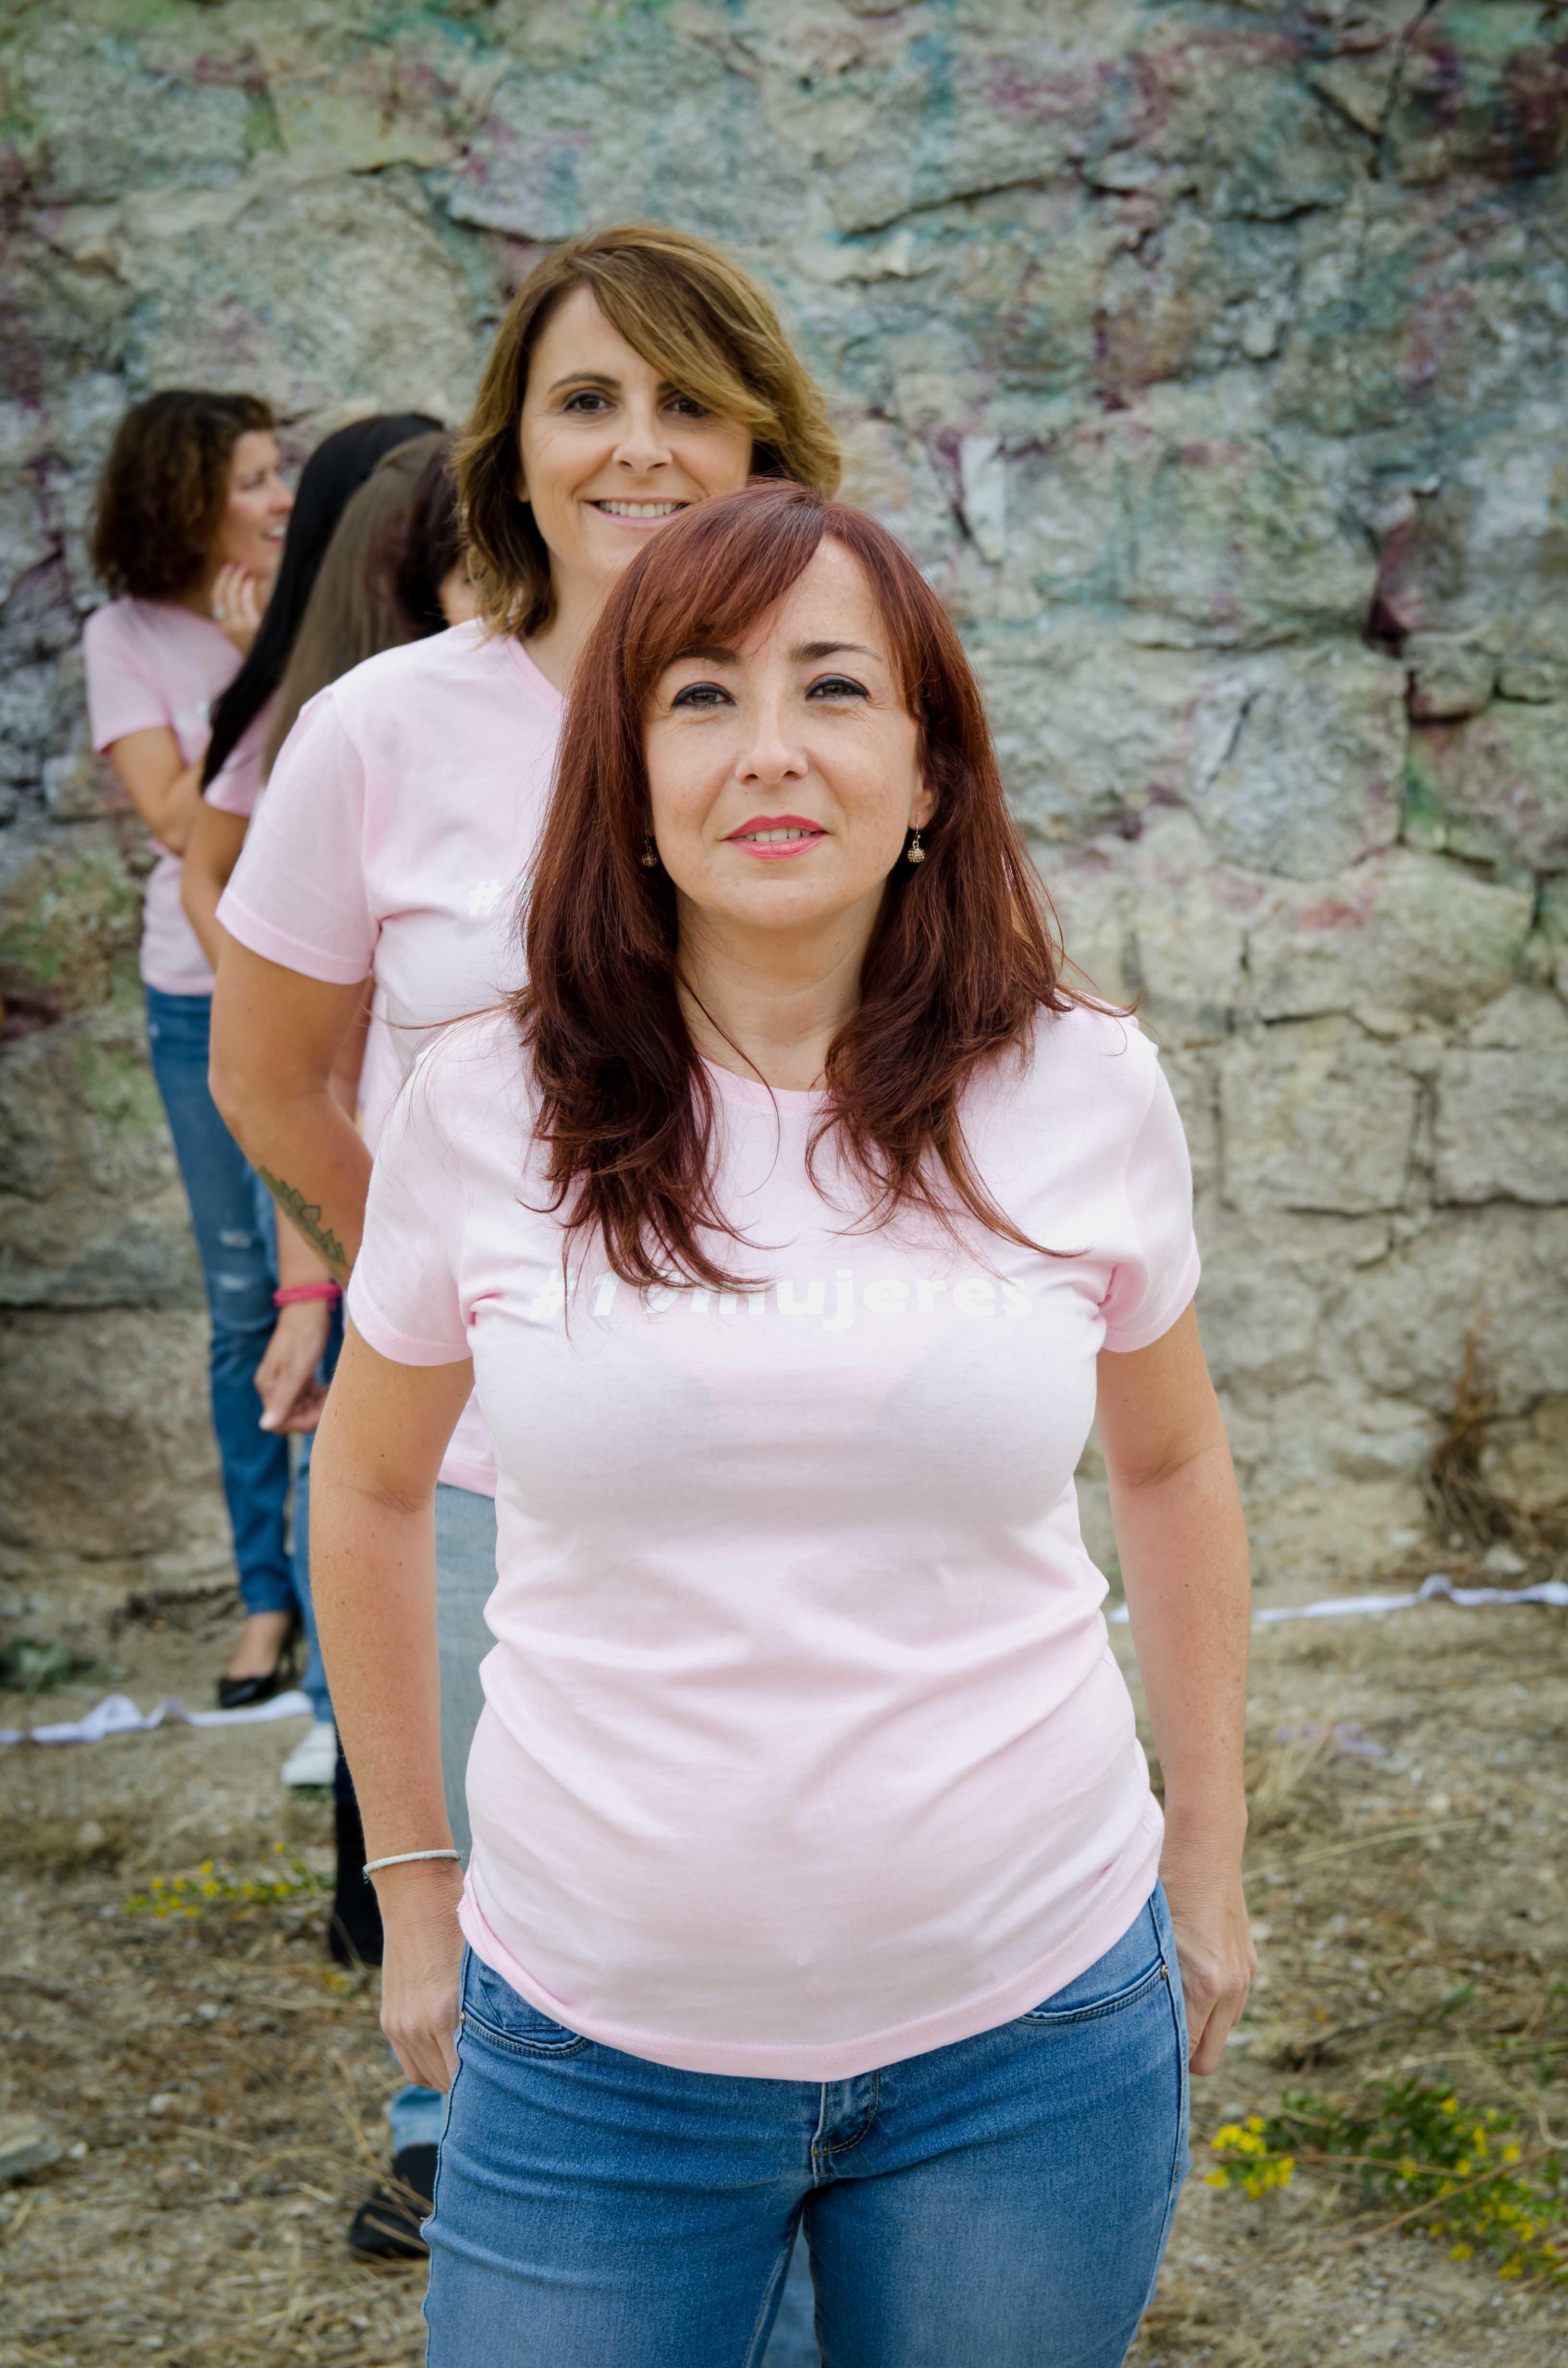 Ana Máñez | #19mujeres | Fernando R. Ortega | Vagamundos